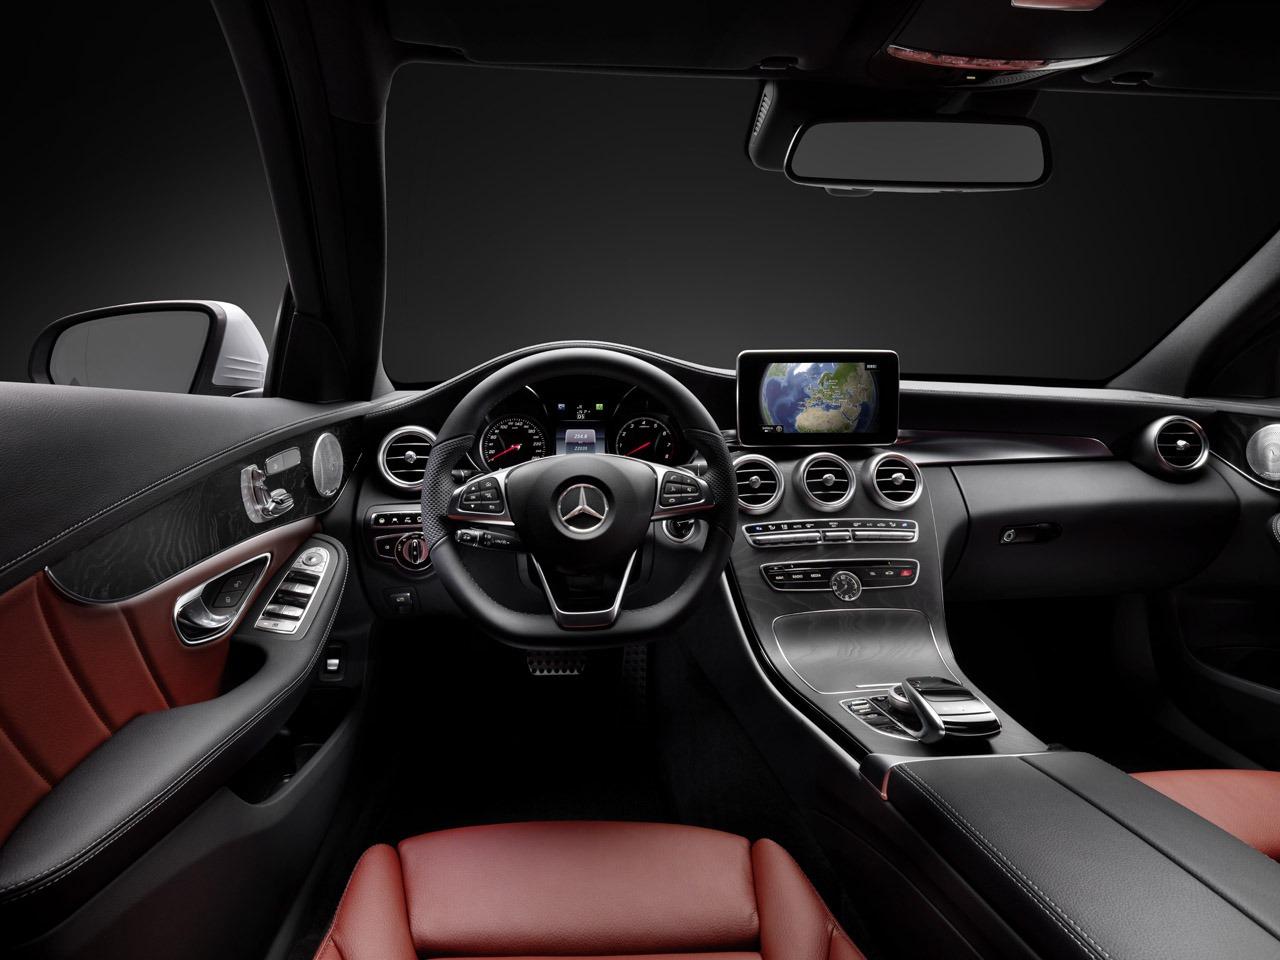 2015 mercedes benz c class interior detailed car weighs. Black Bedroom Furniture Sets. Home Design Ideas